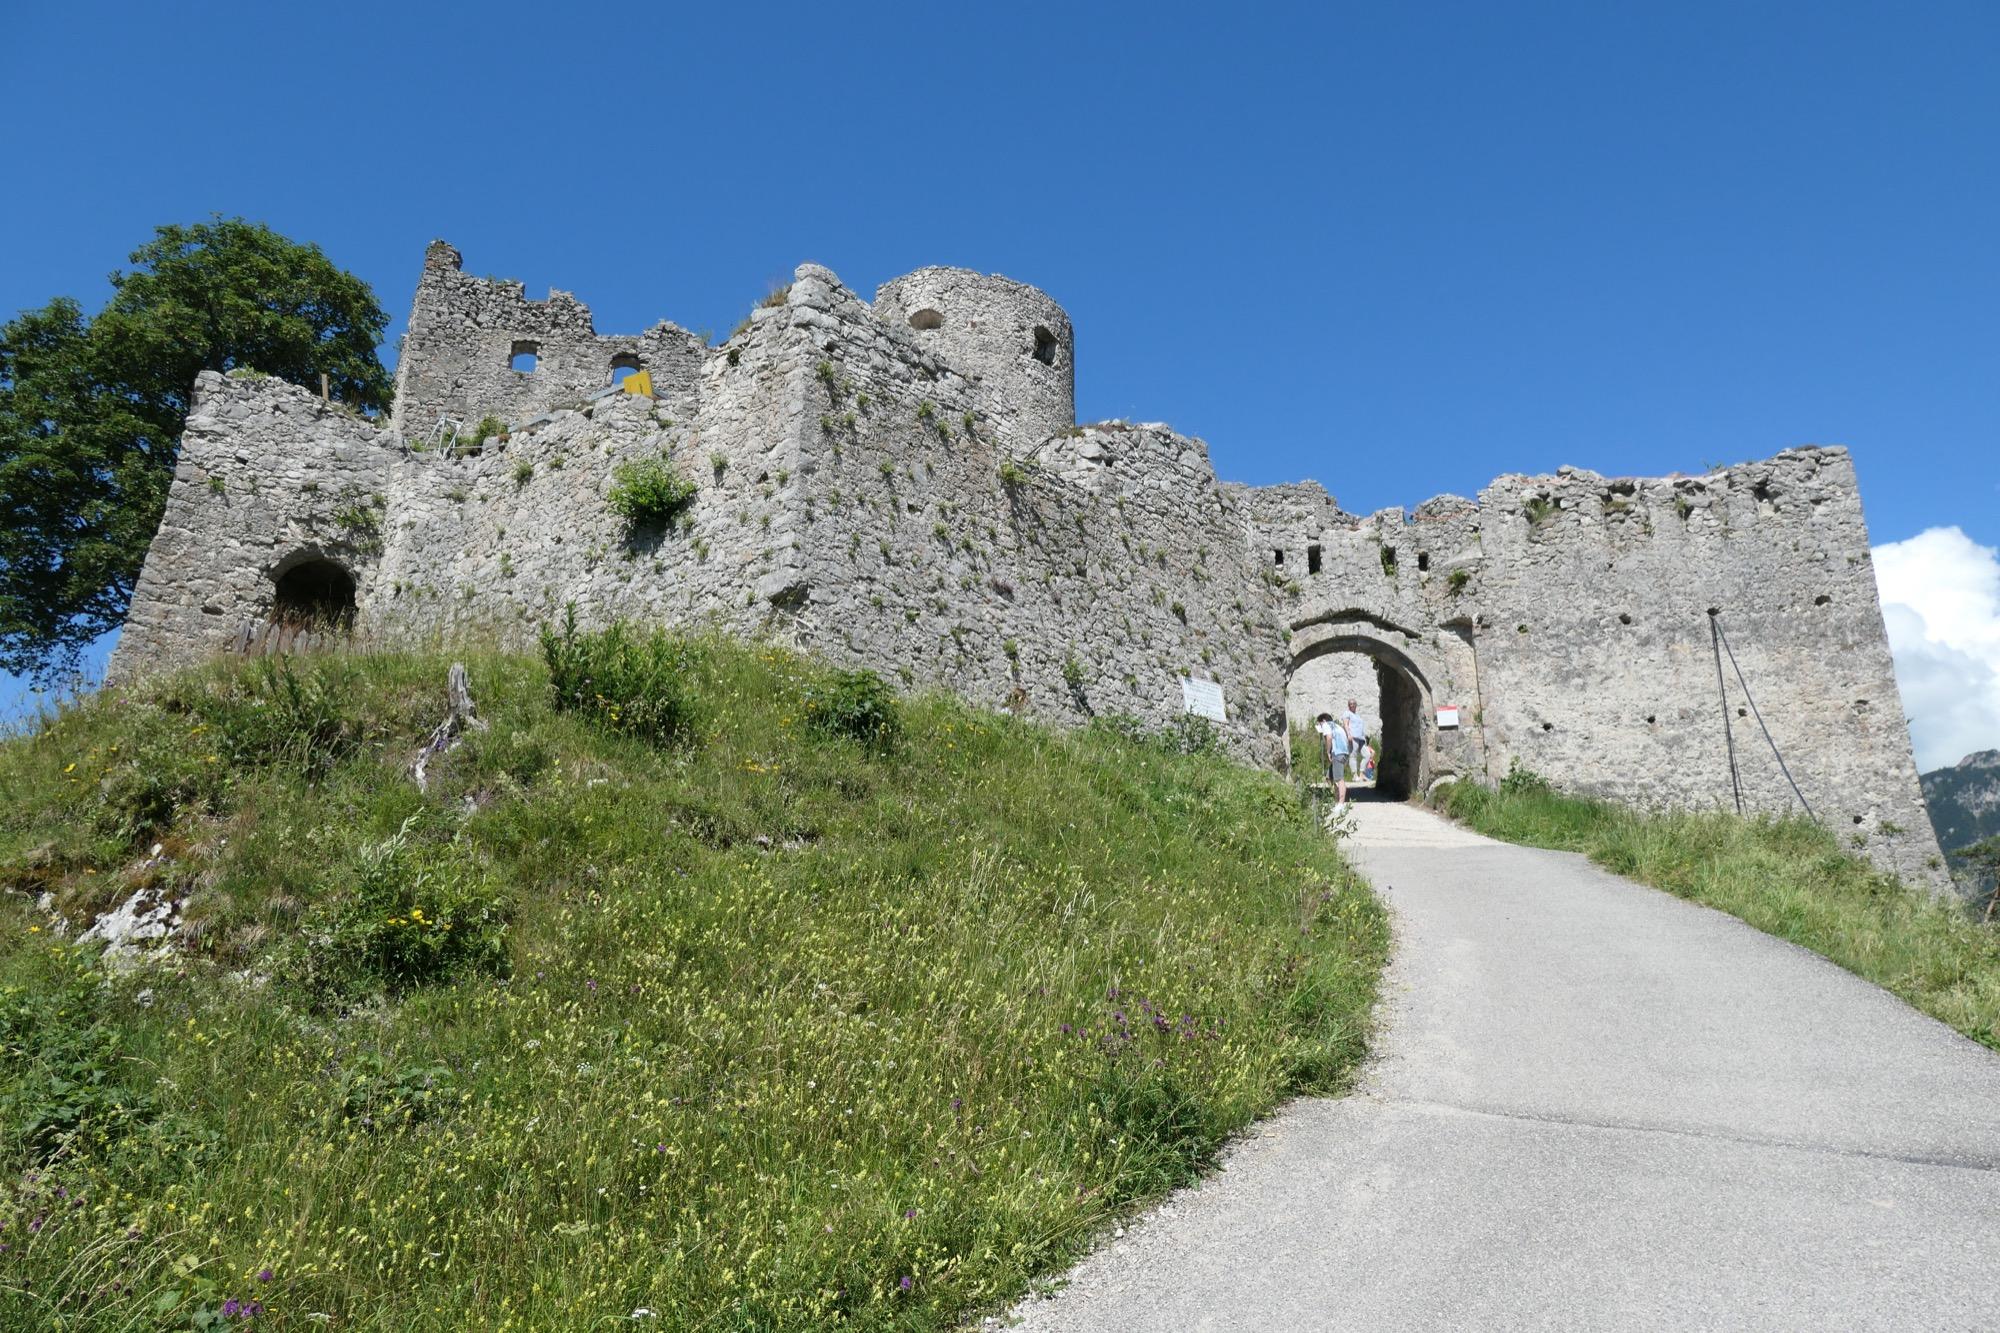 Main Gate of Ehrenberg Castle